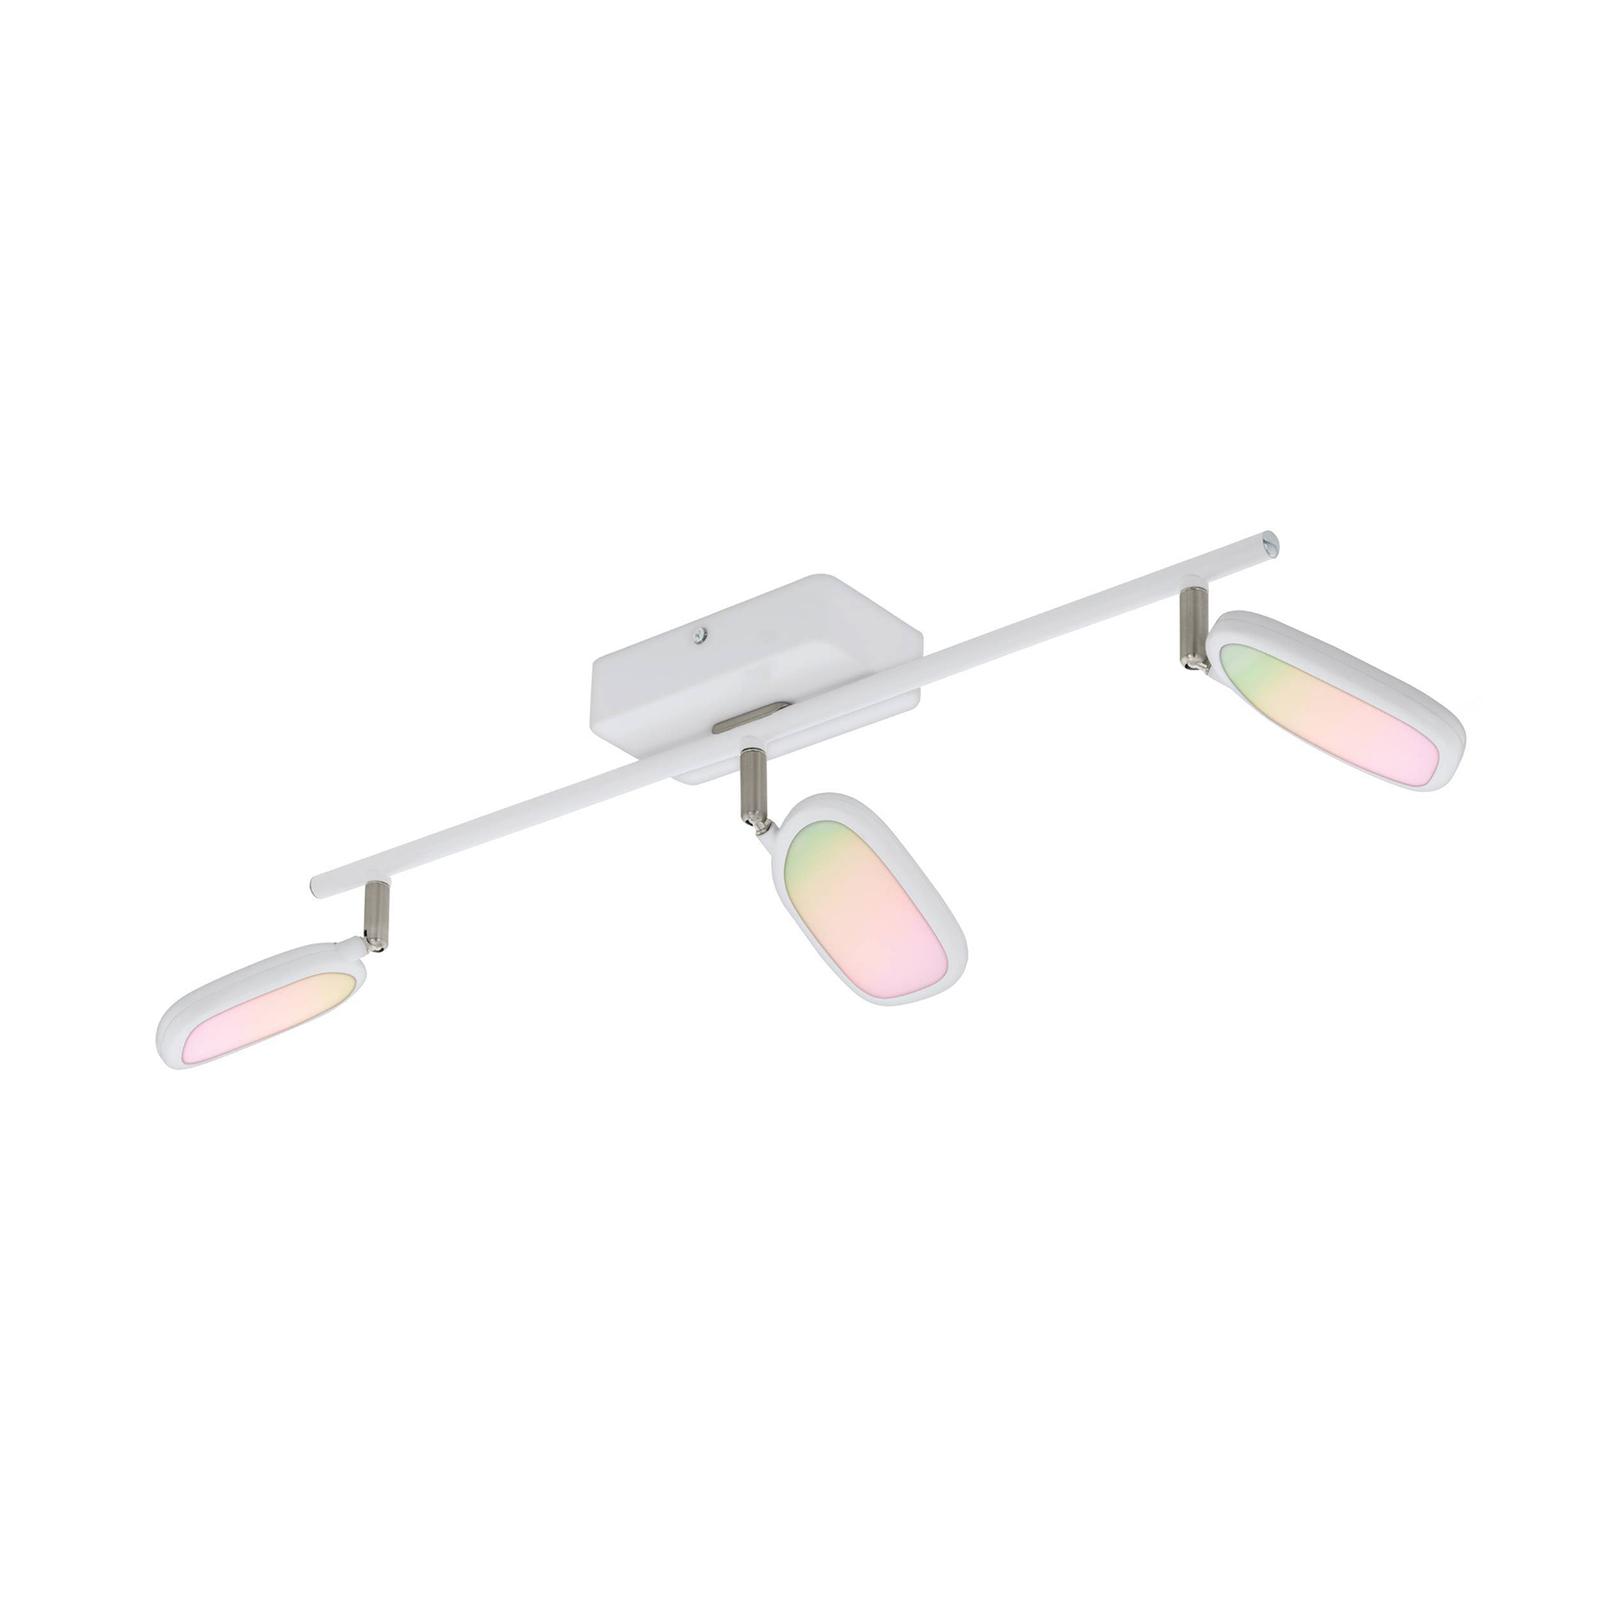 EGLO connect Palombare-C LED-loftspot, 3 lyskilder